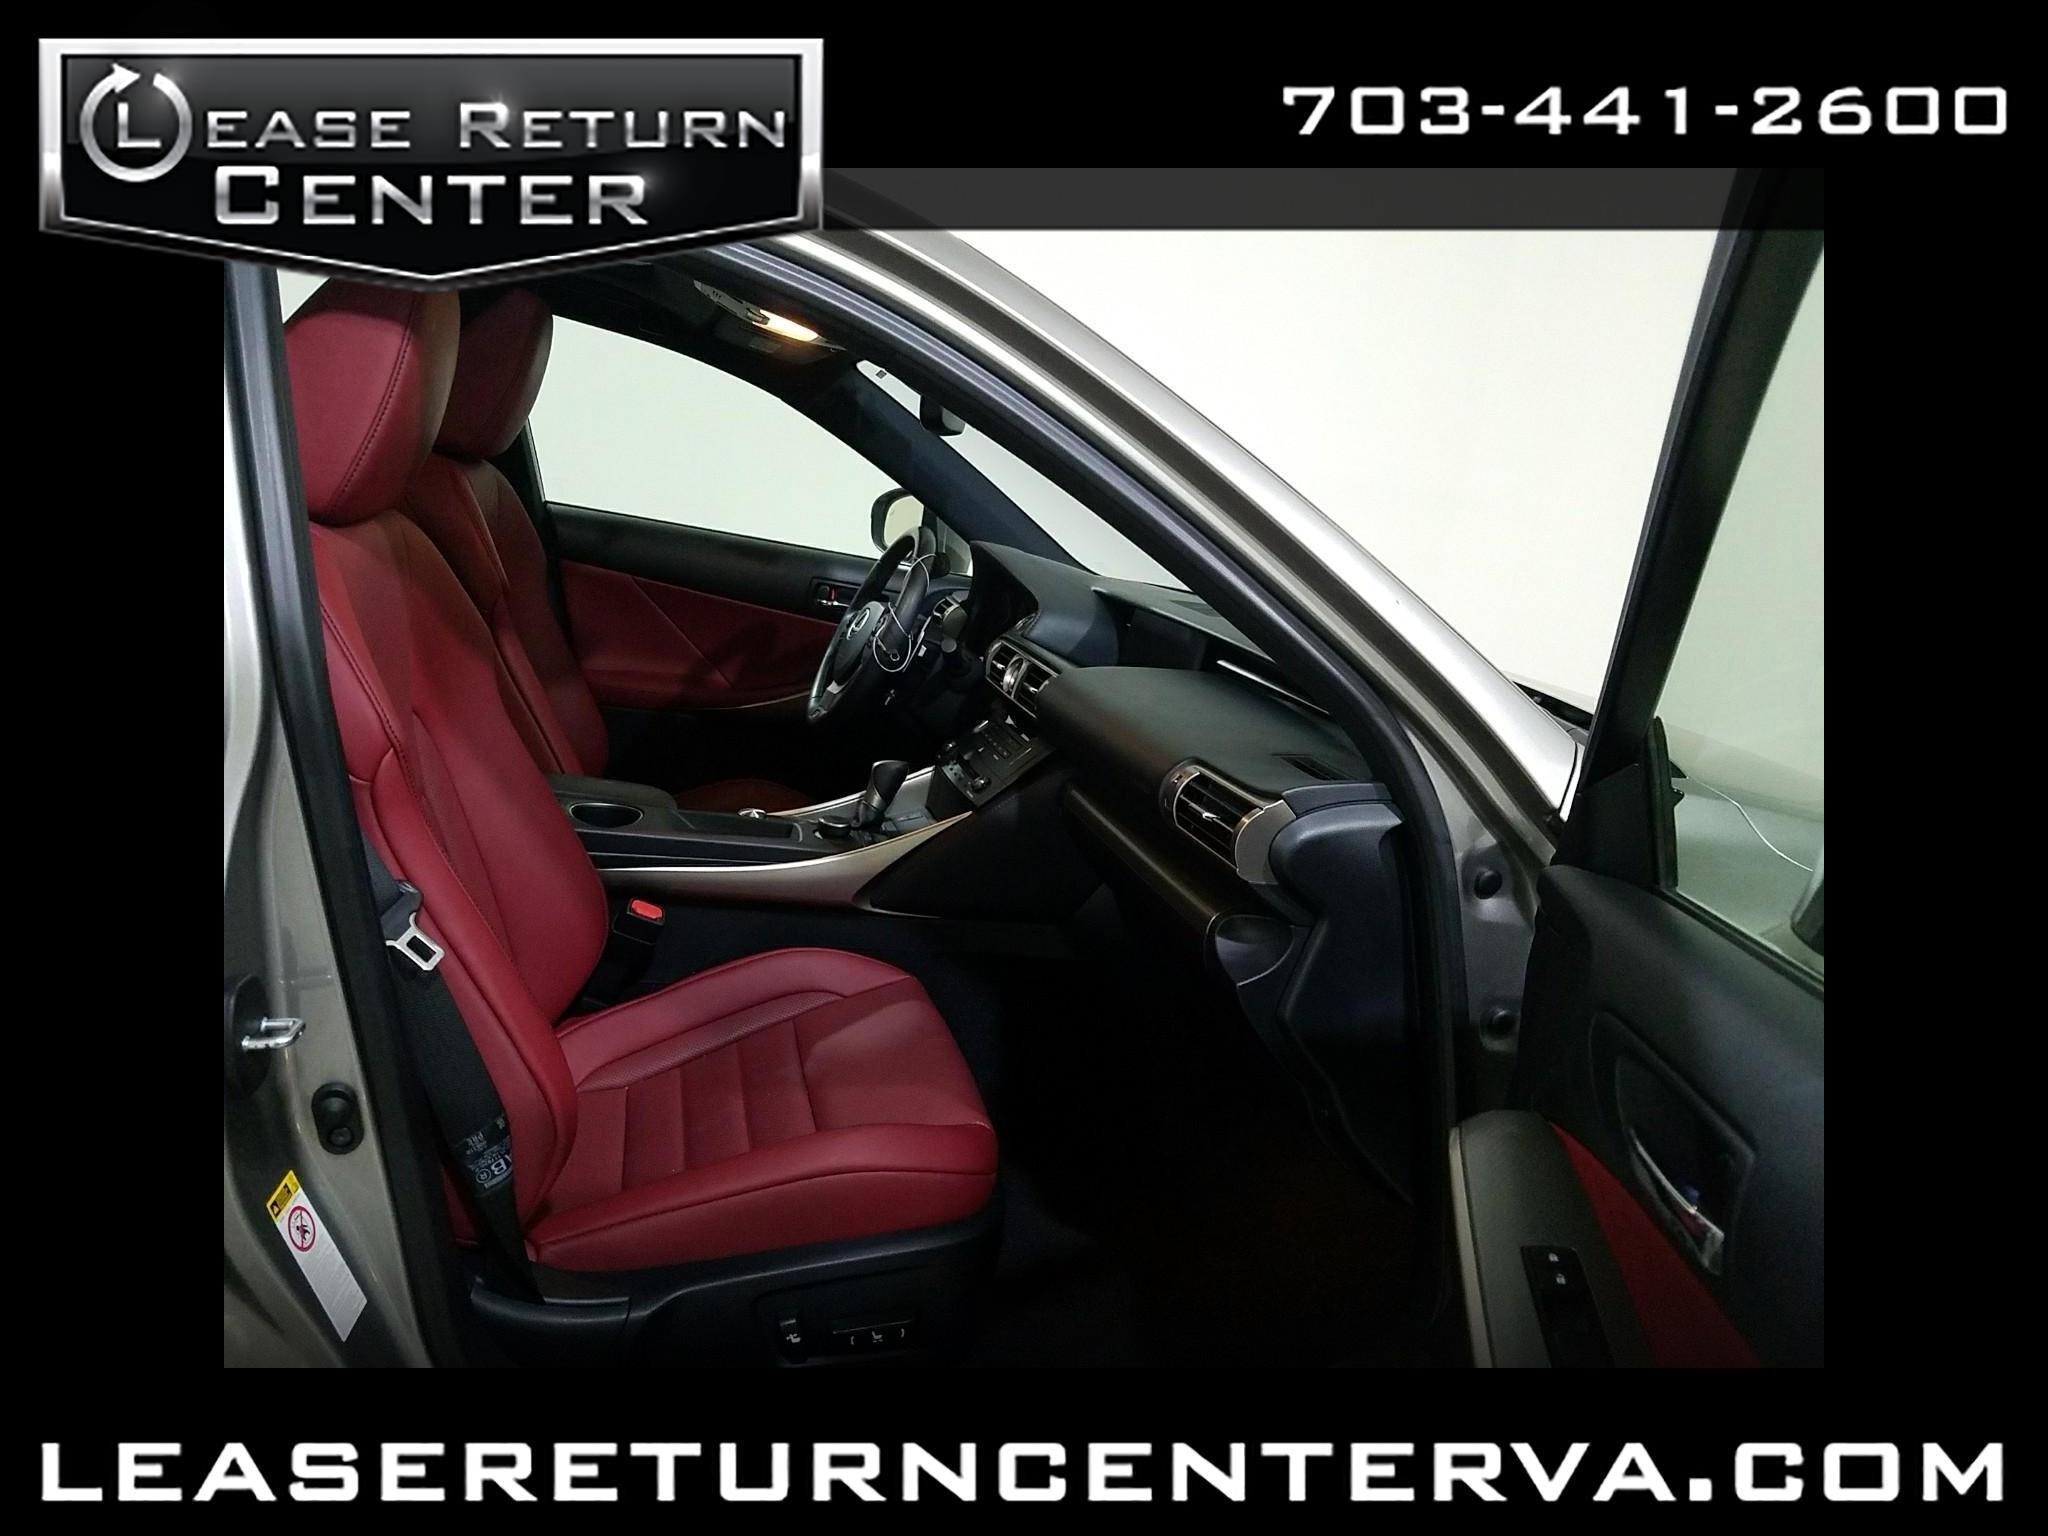 2016 Lexus IS 300 Fsport AWD